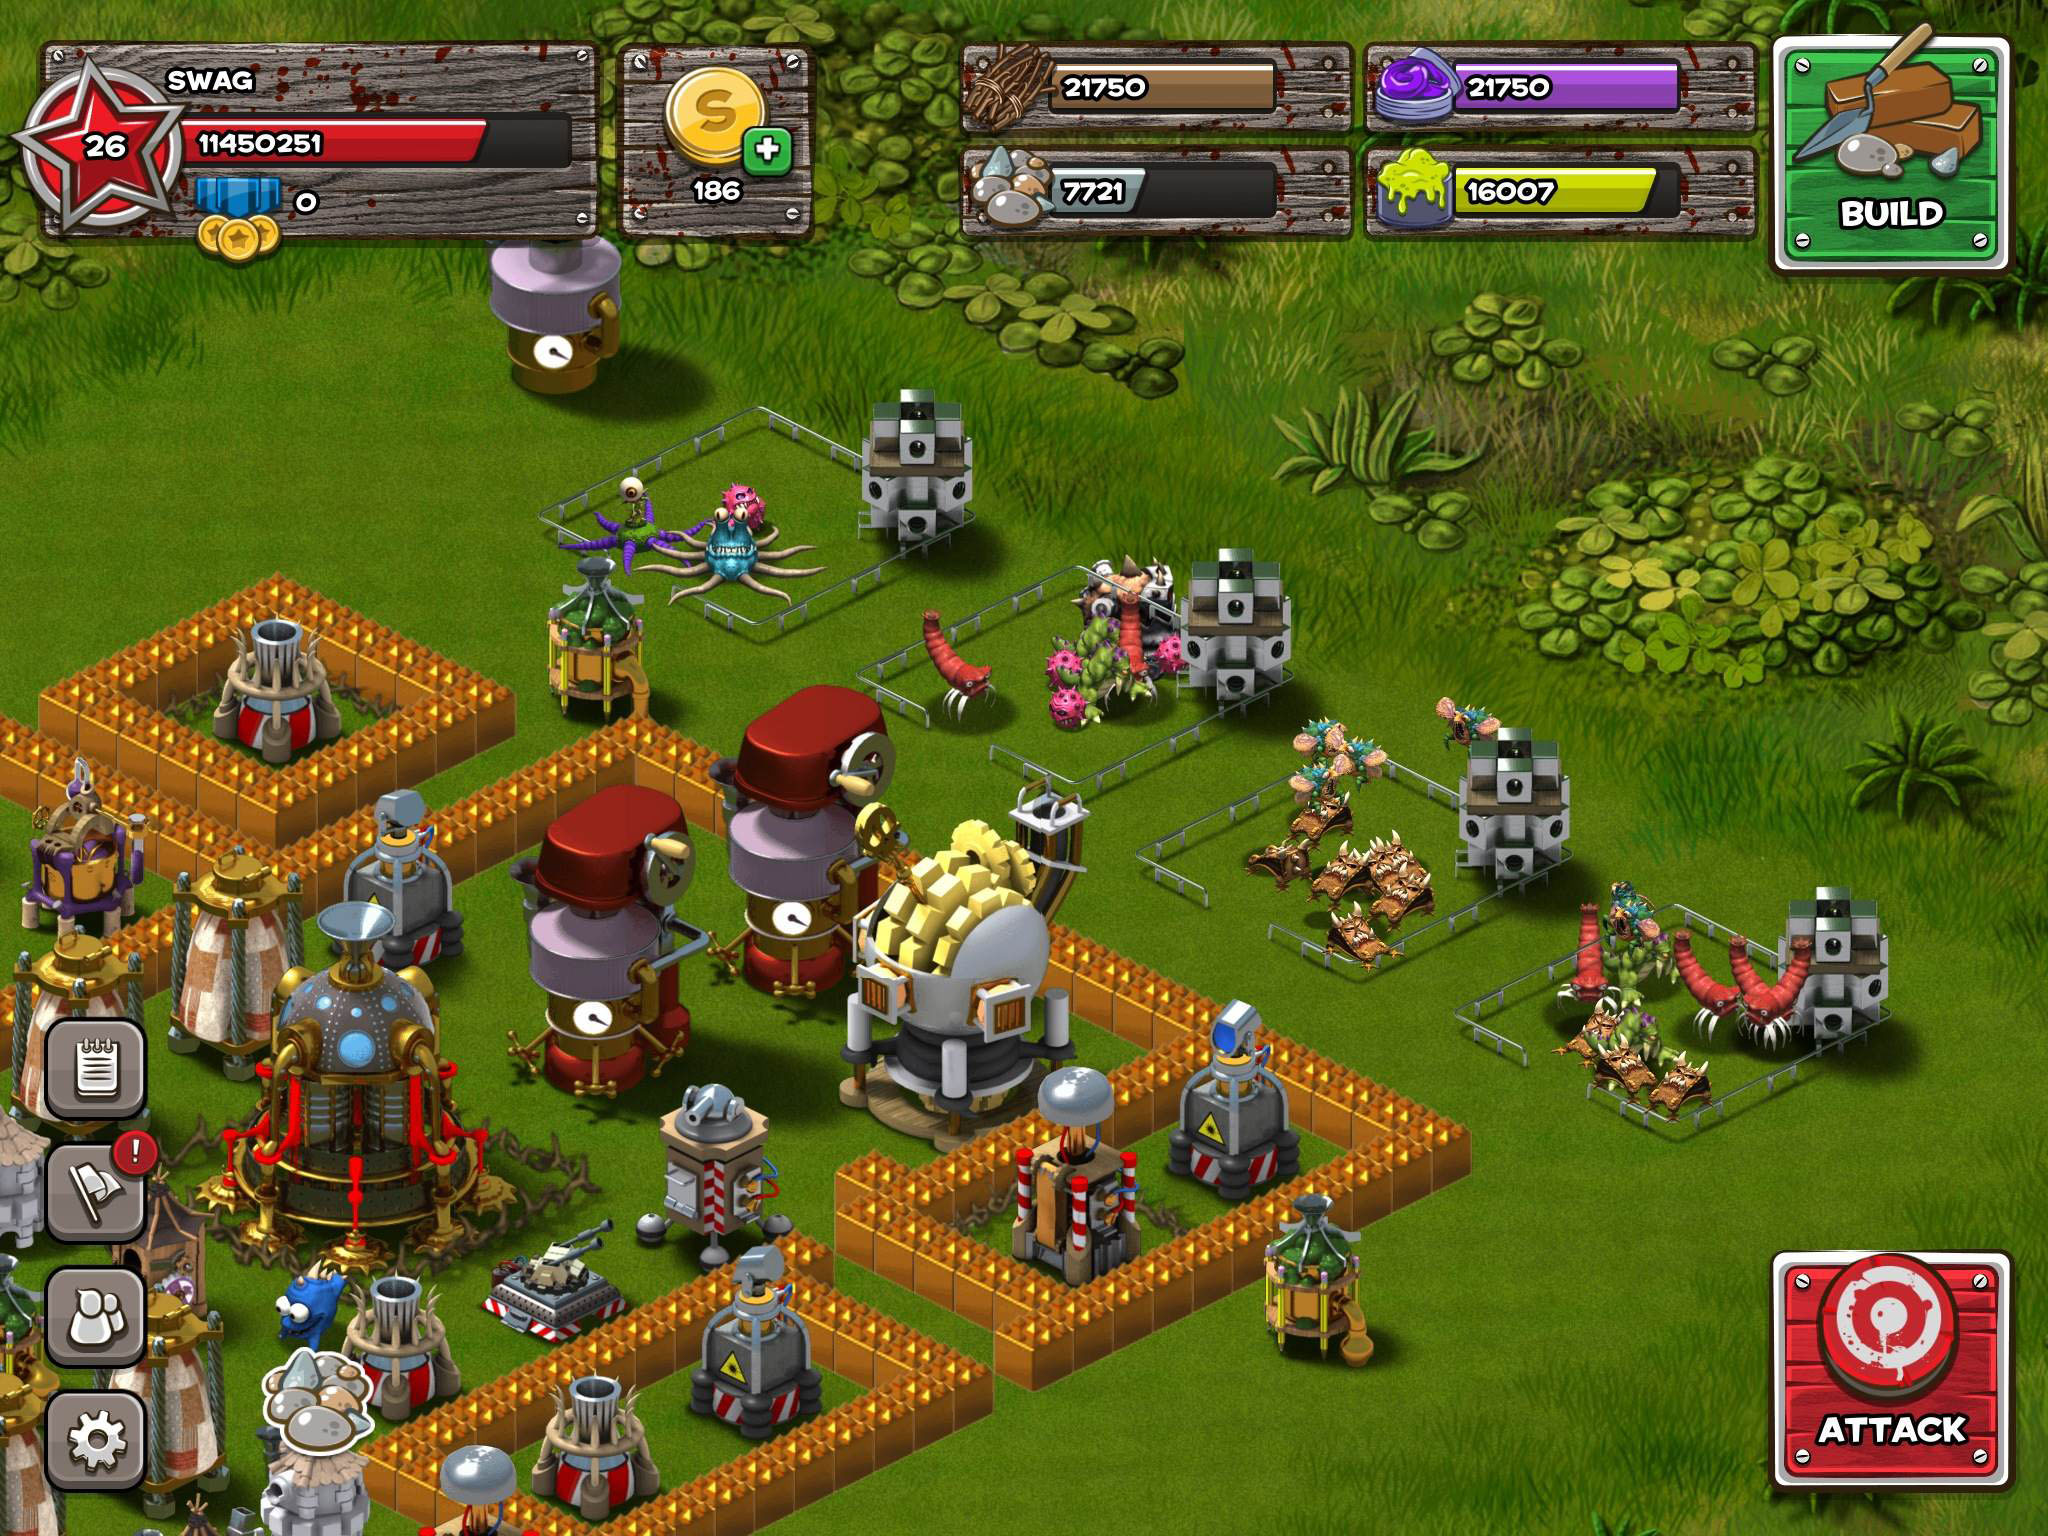 Backyard Monsters: Unleashed IPhone,iPad, Screenshot 2